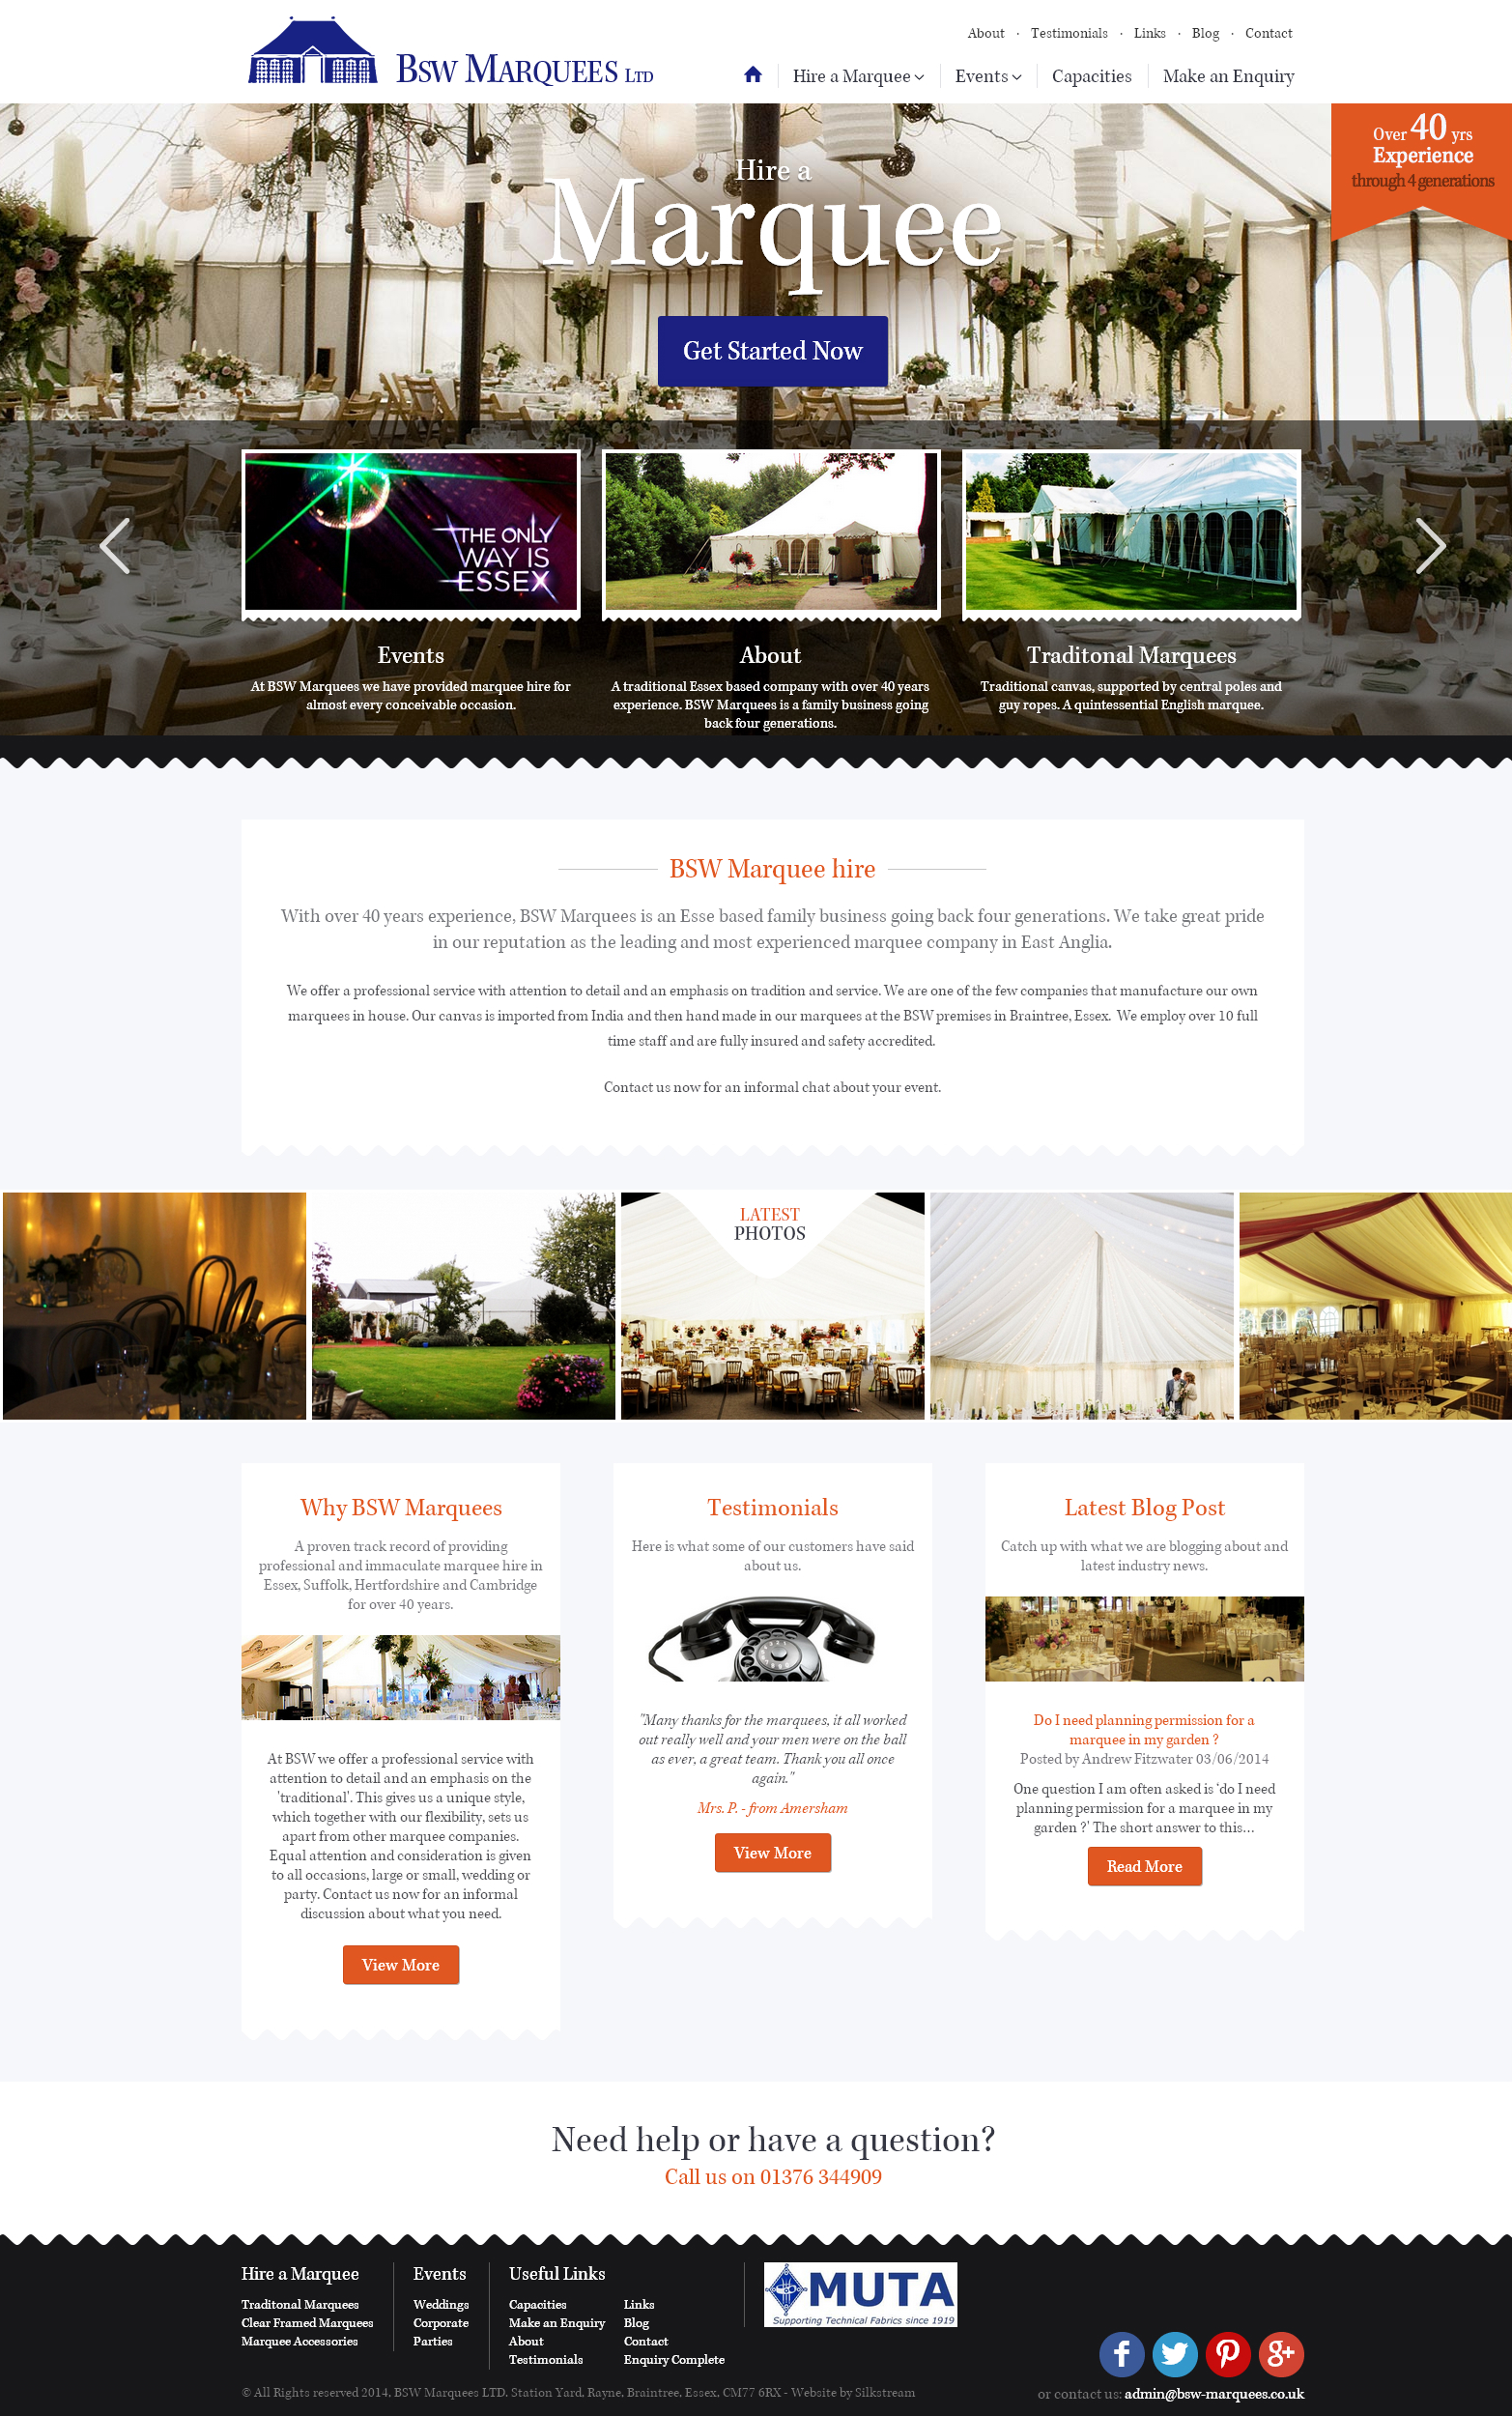 BSW Marquees website design